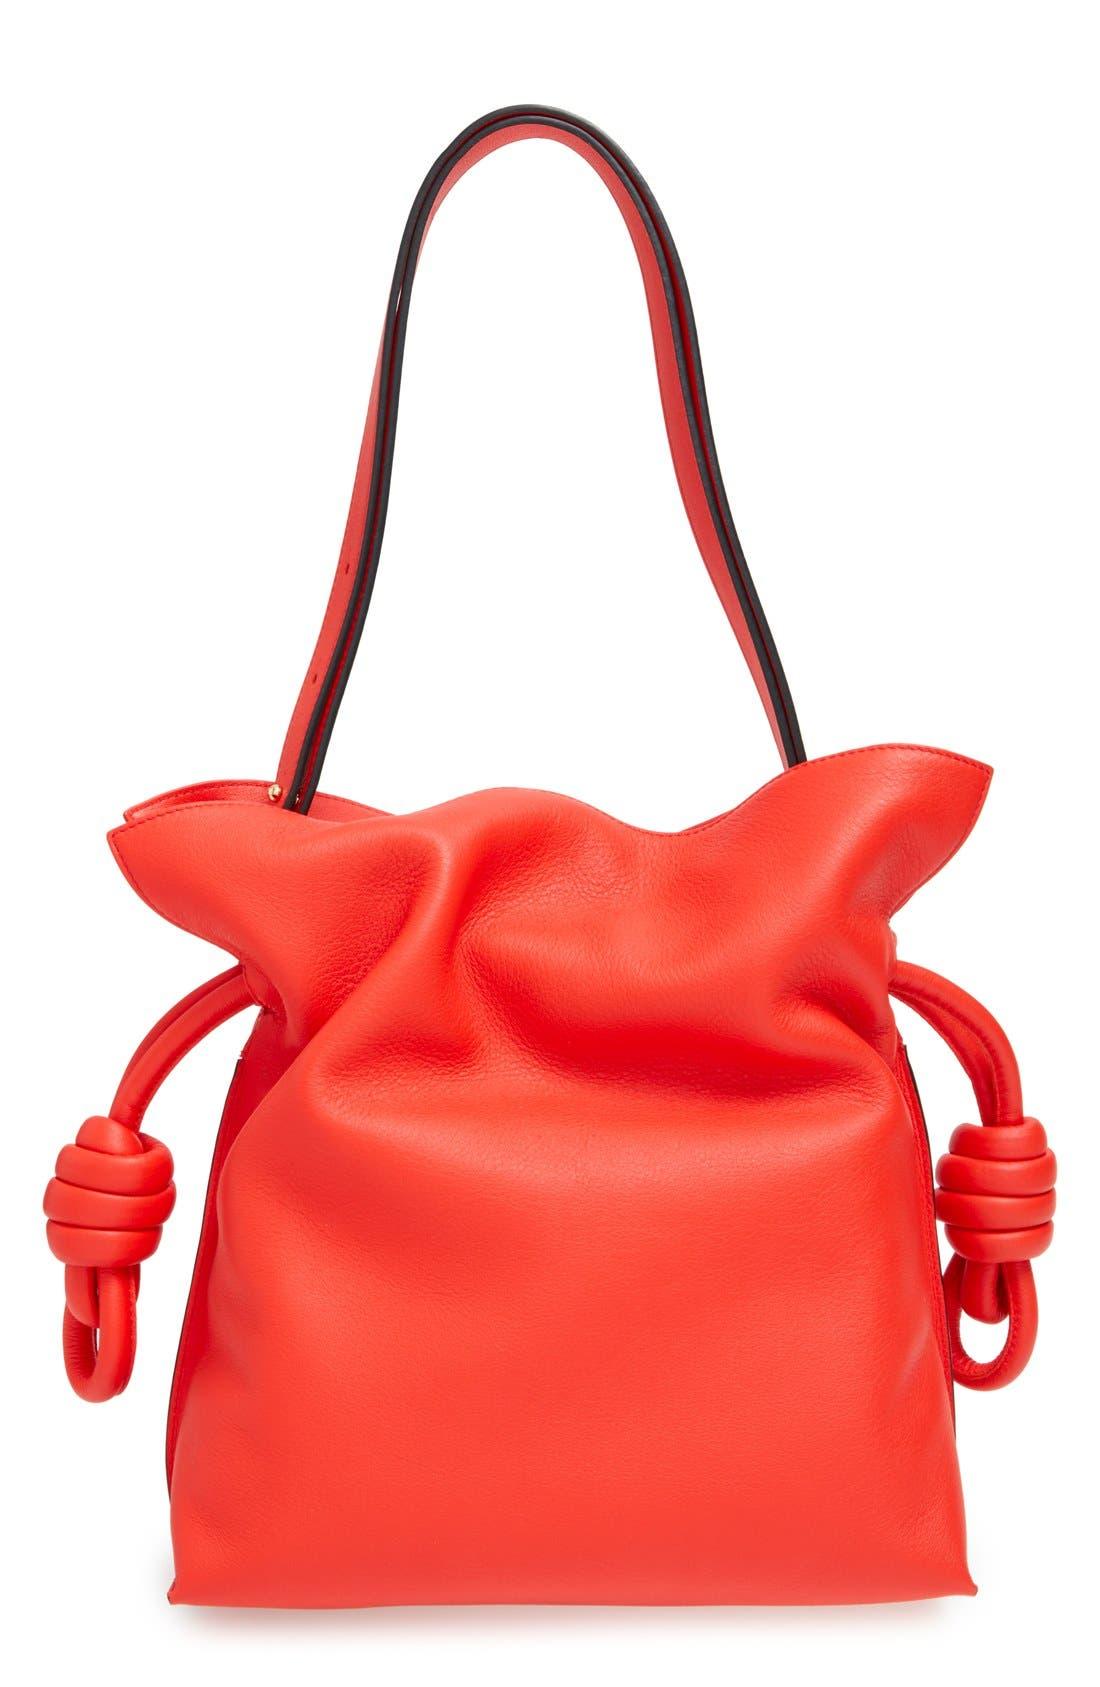 Alternate Image 3  - Loewe 'Small Flamenco Knot' Calfskin Leather Bag